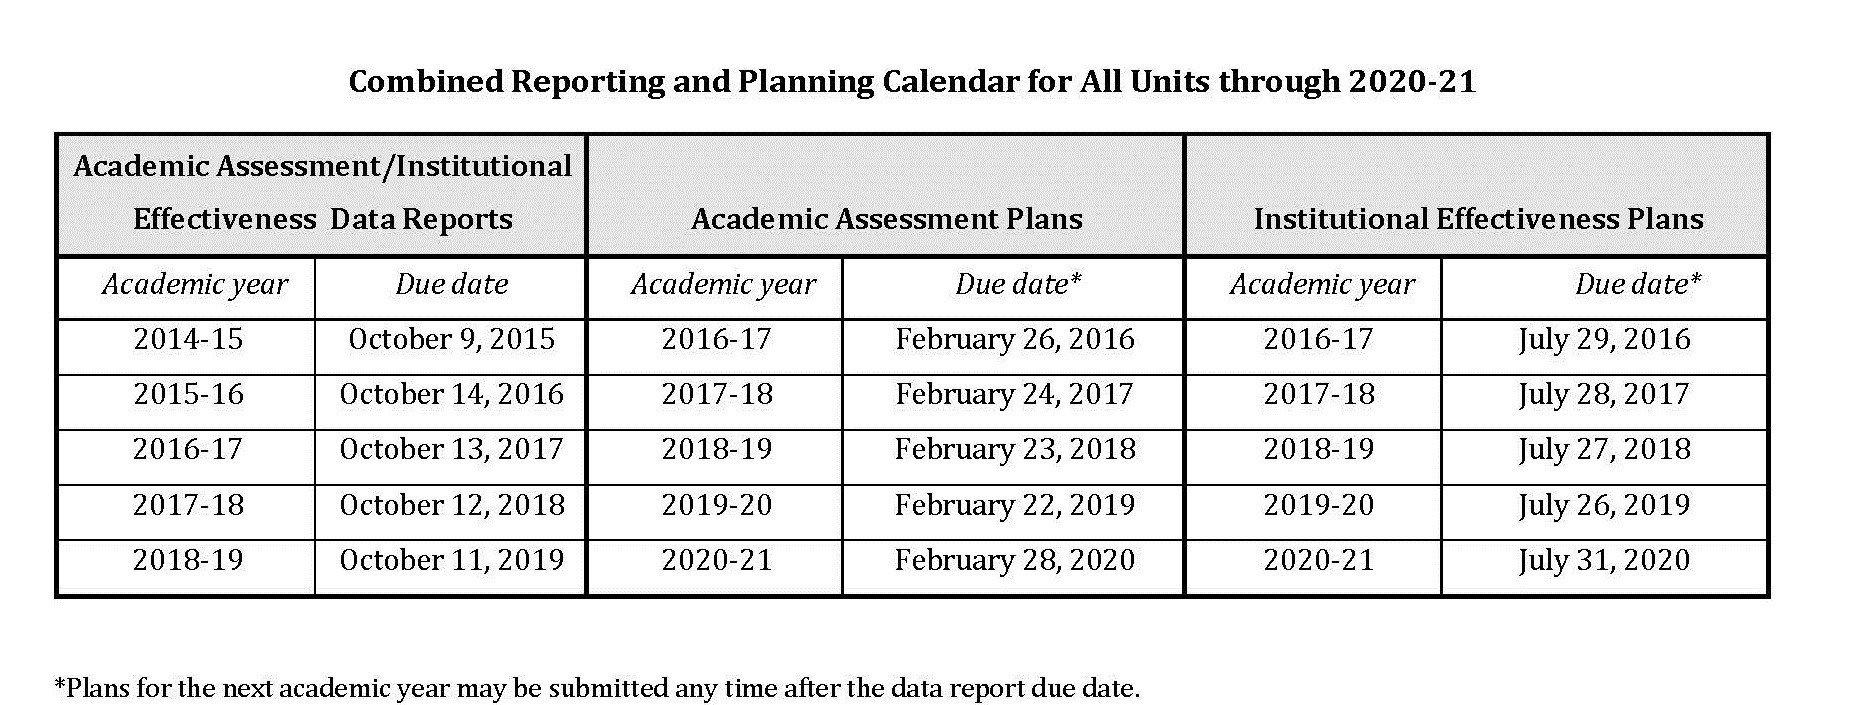 Uf Academic Calendar Free 2017 2018 1 Uf 2017 2018 Calendar Calendar 2019 Uf